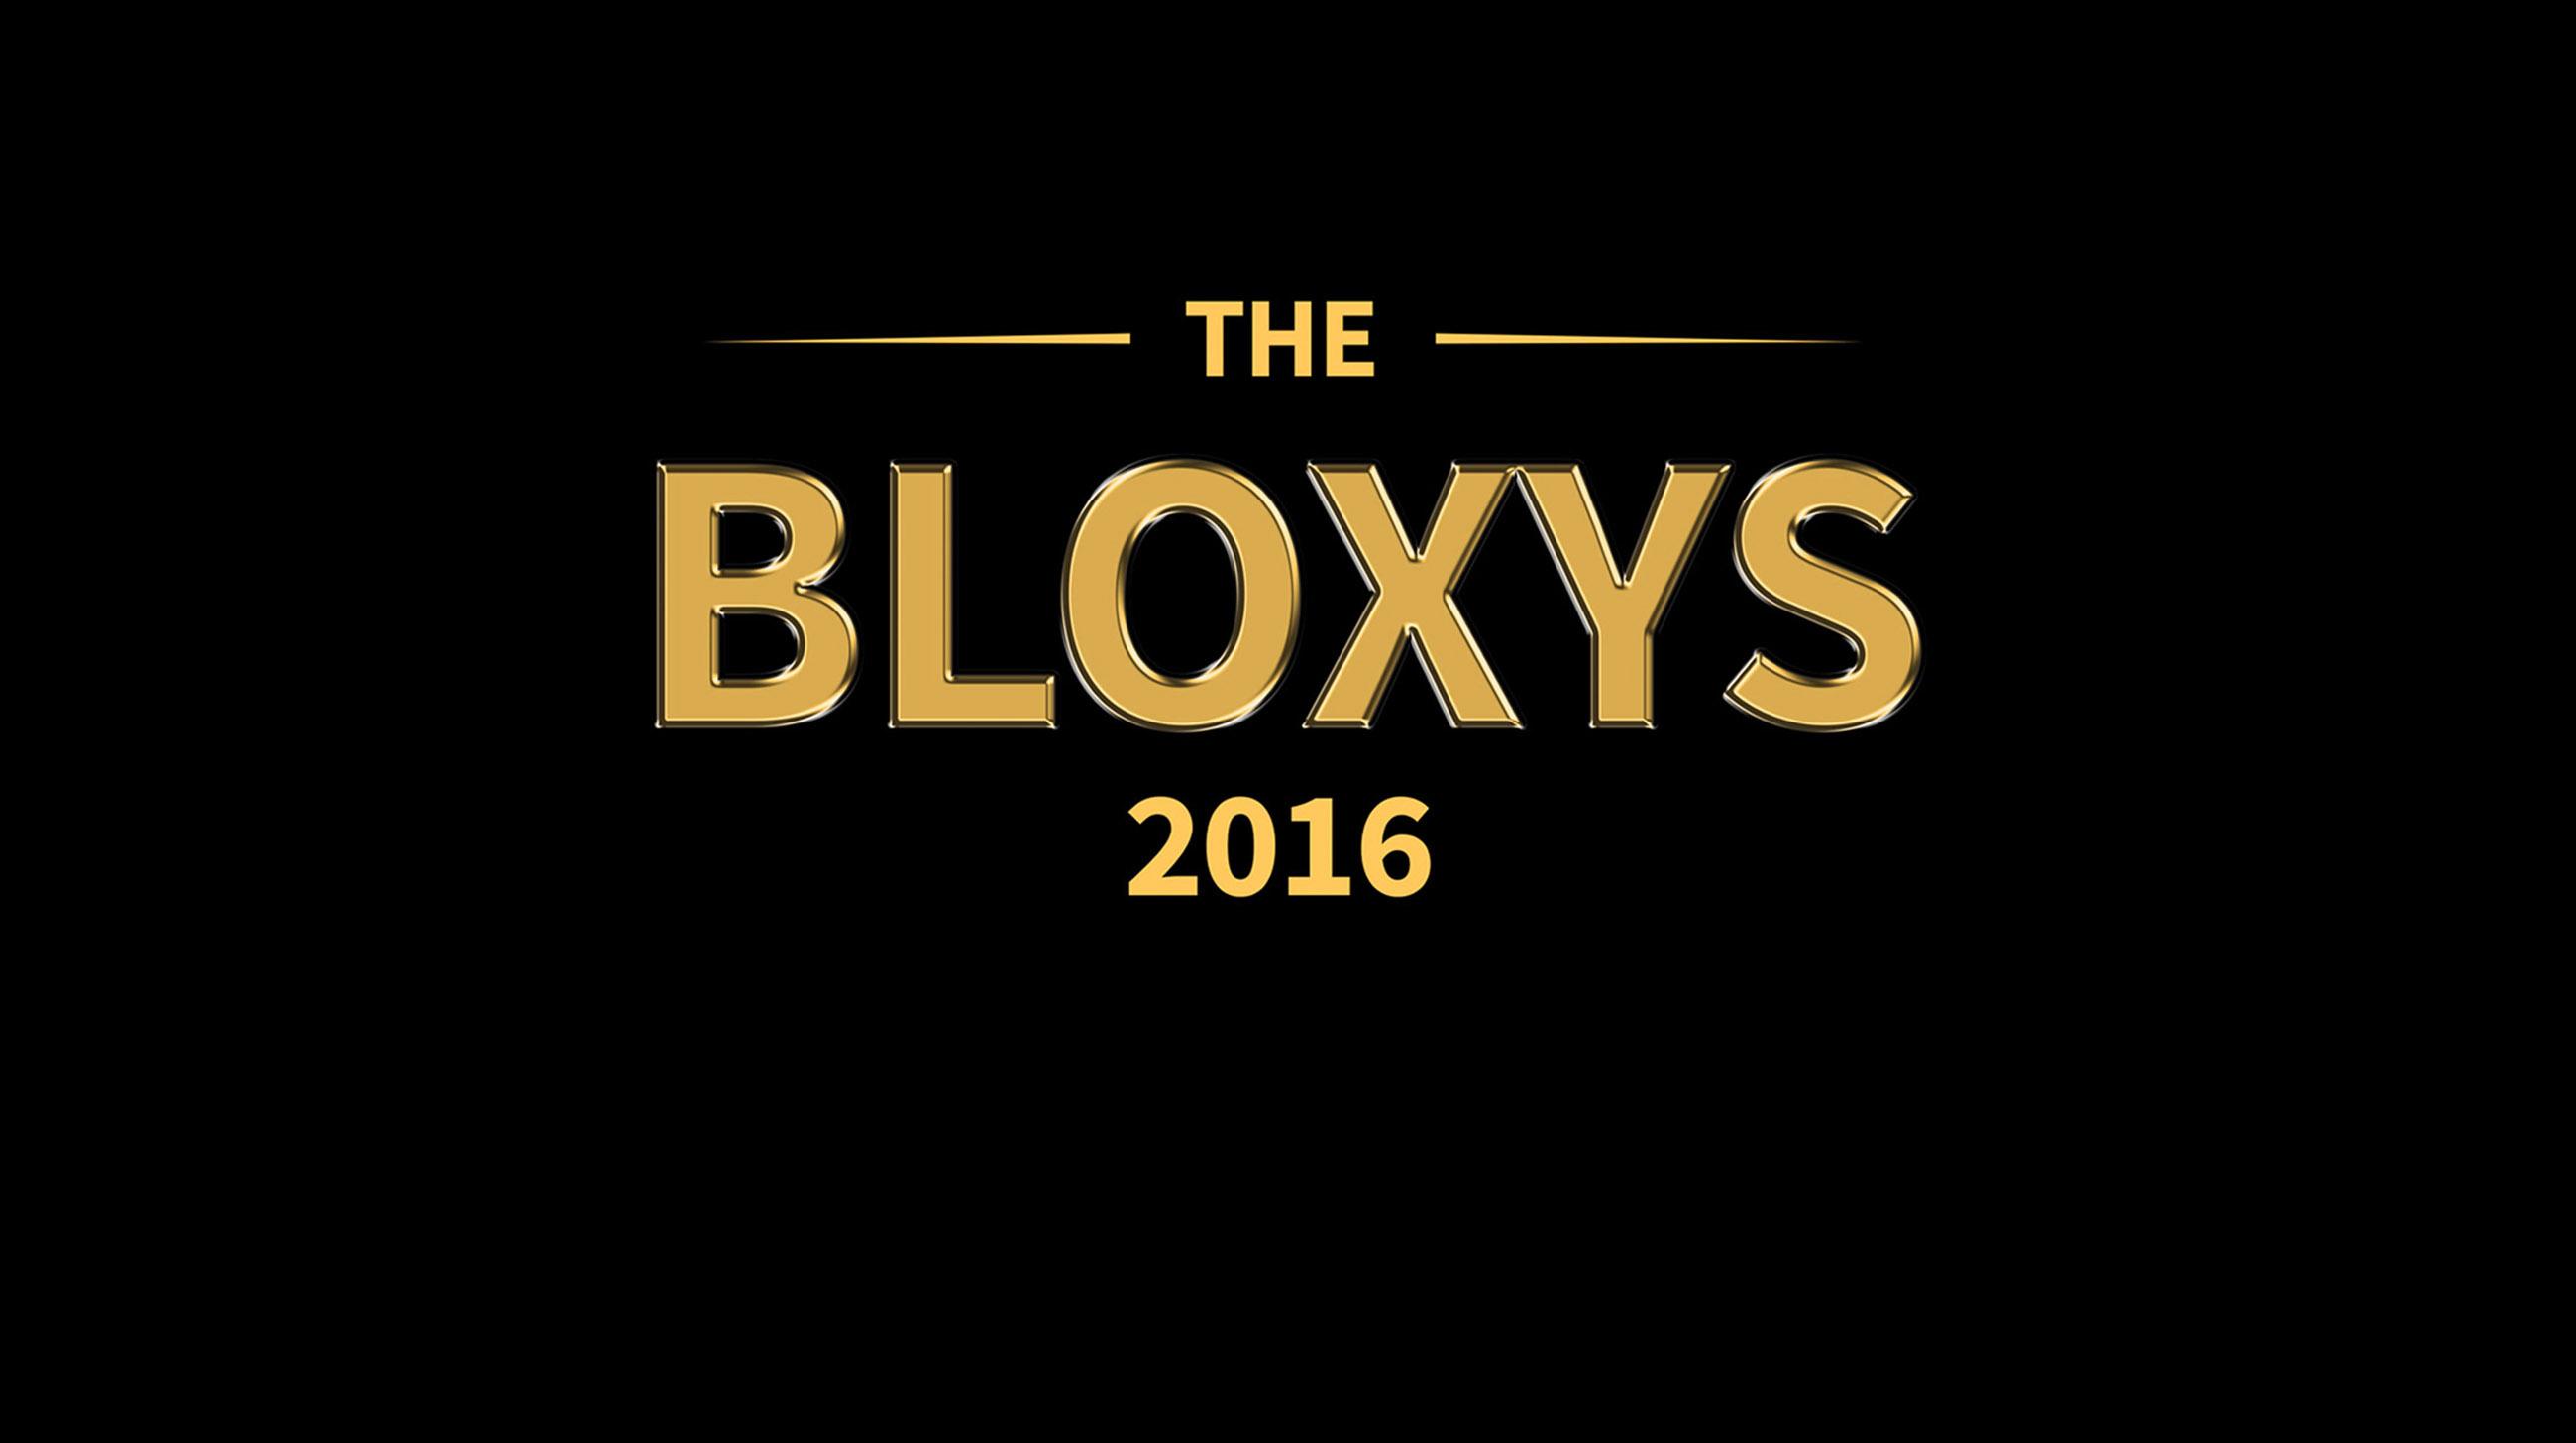 The 2016 Bloxy Awards